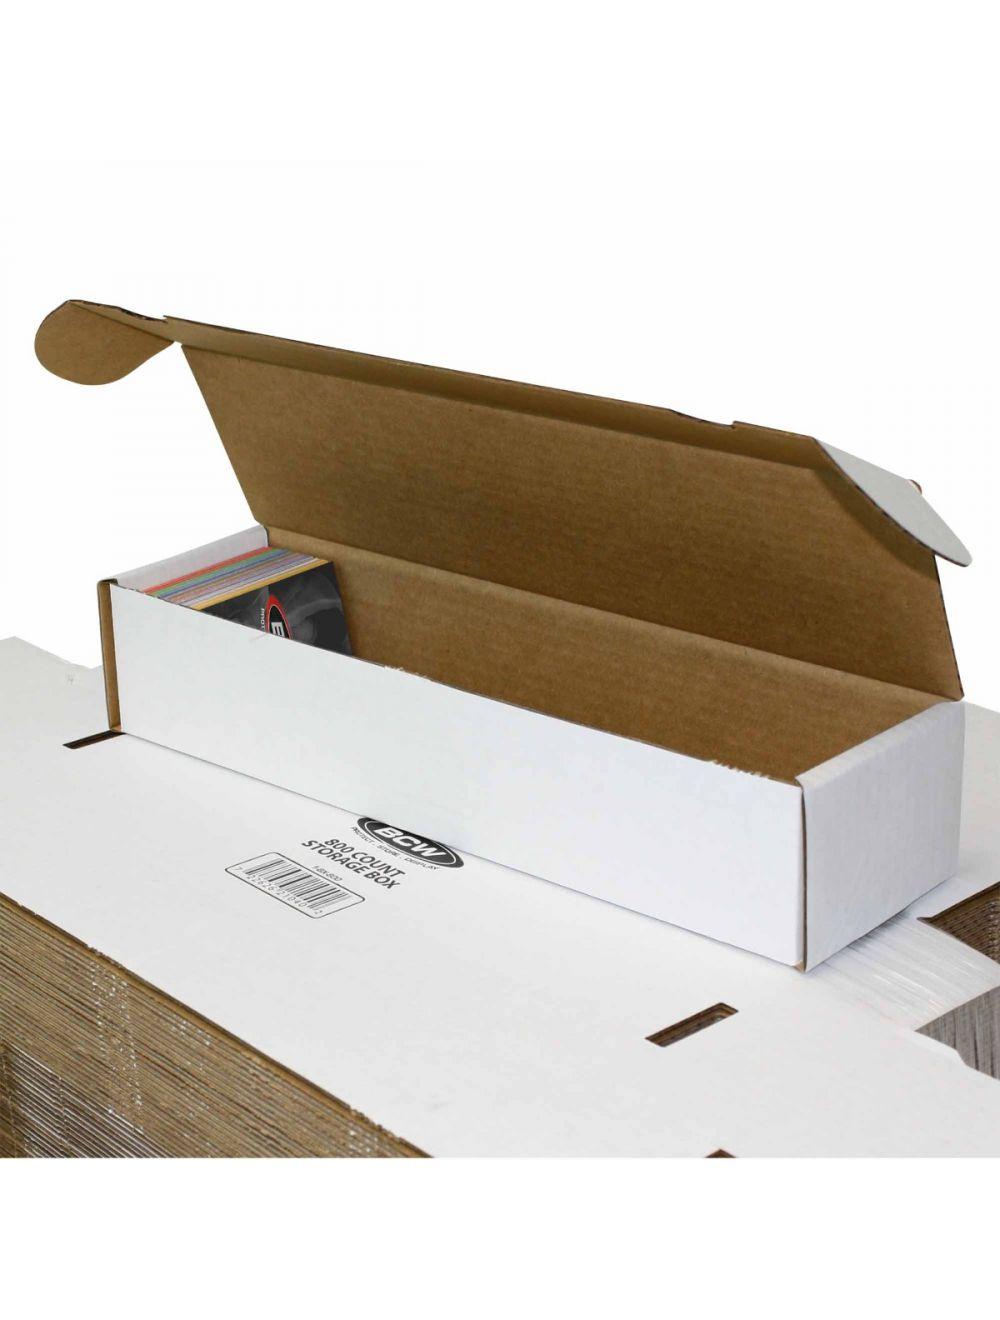 800 Count Storage Box